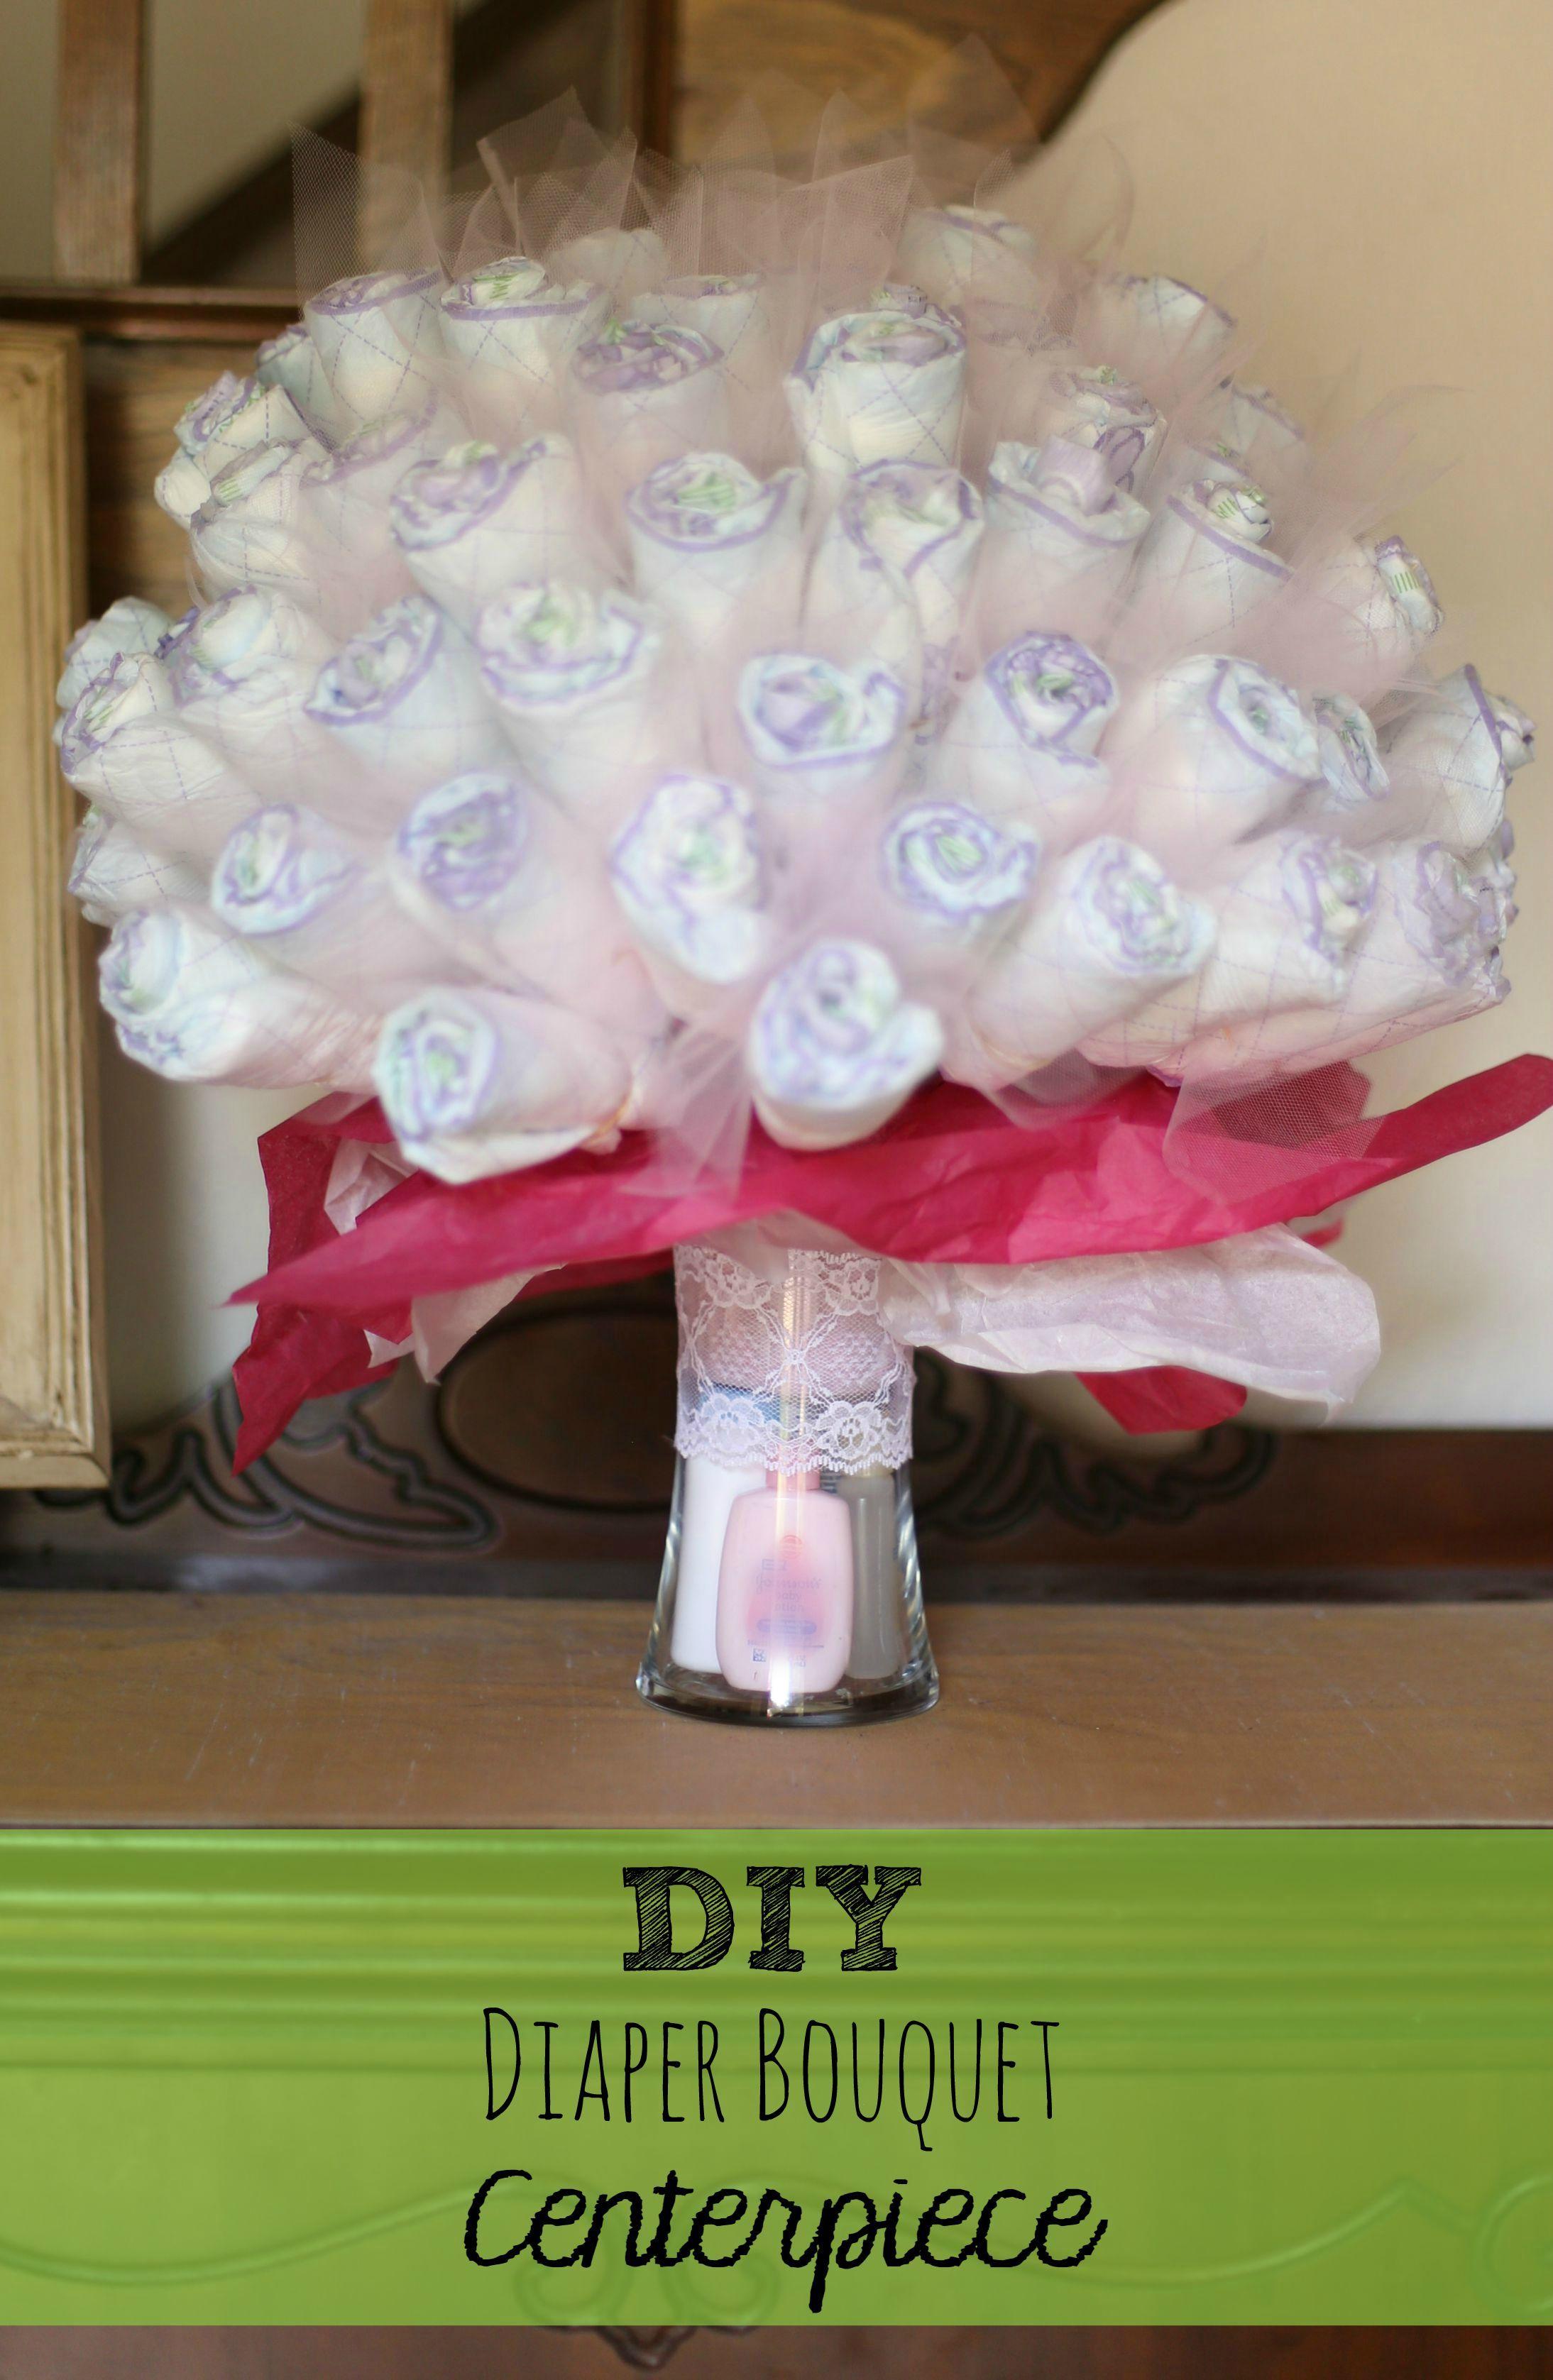 Diy Diaper Bouquet Centerpiece Perfect Baby Shower Gift Idea